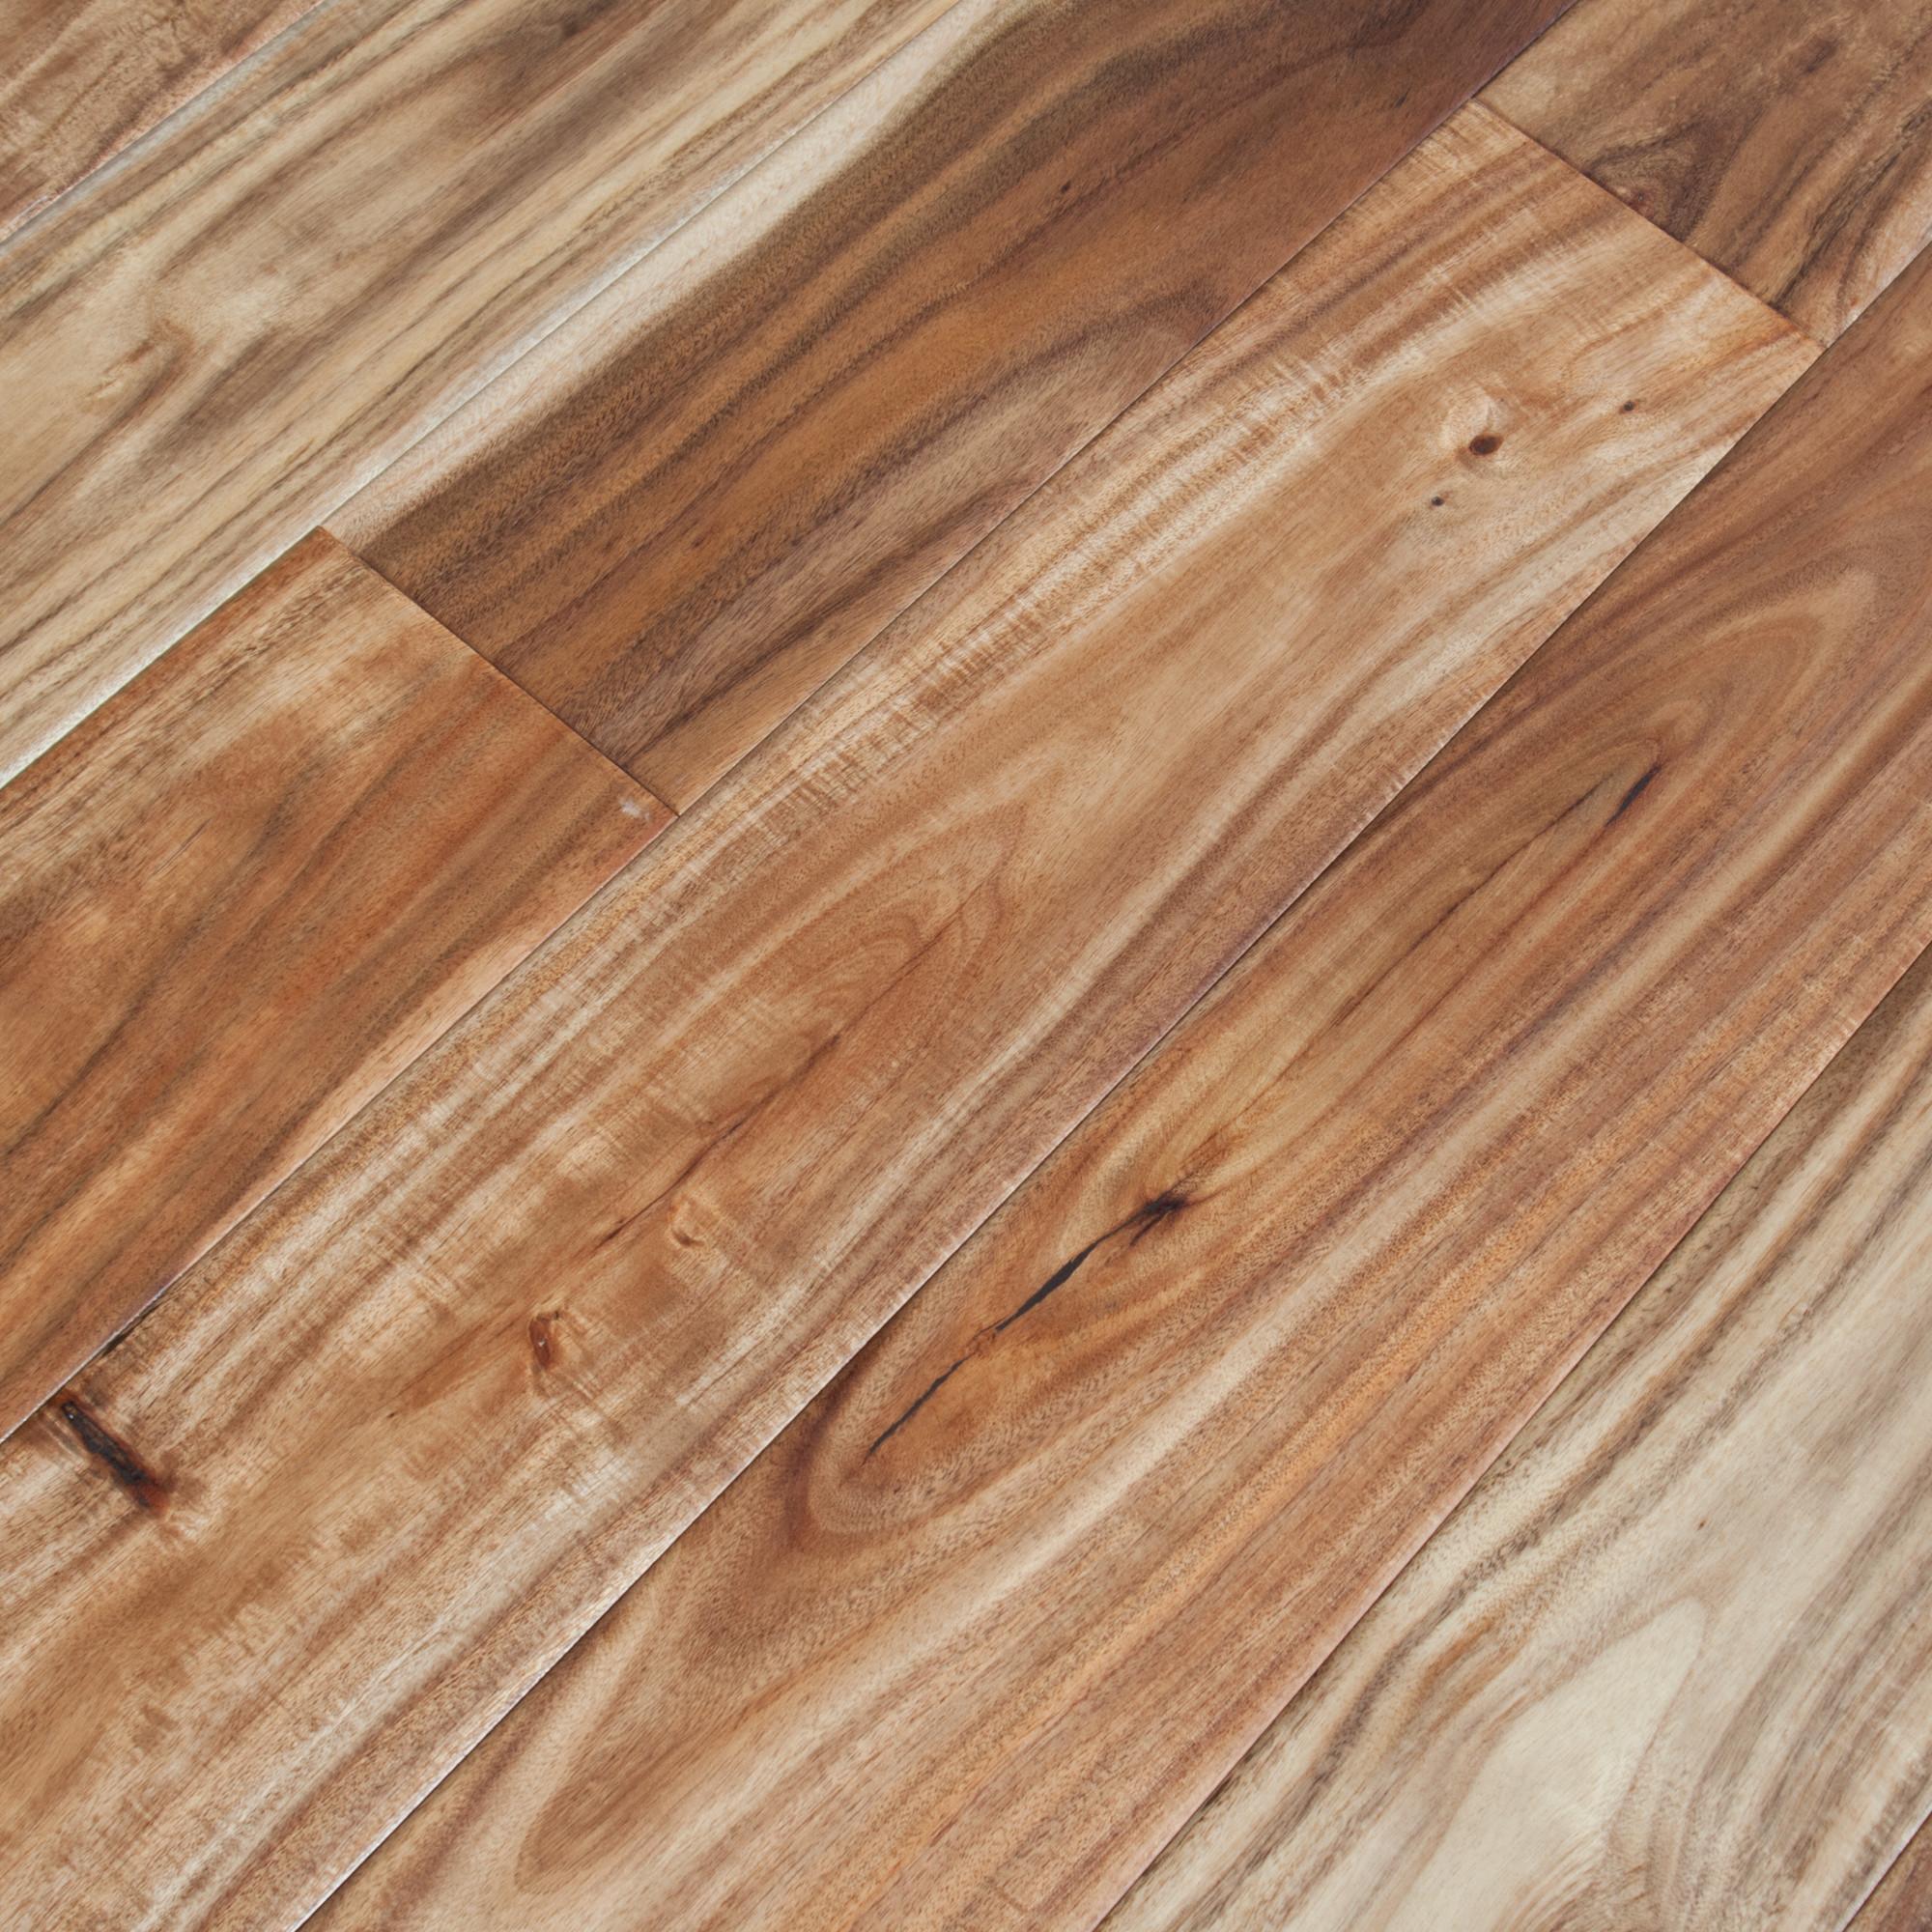 hardwood flooring lowest price of 9 mile creek acacia hand scraped acacia confusa wood floors pertaining to acacia handscraped natural hardwood flooring